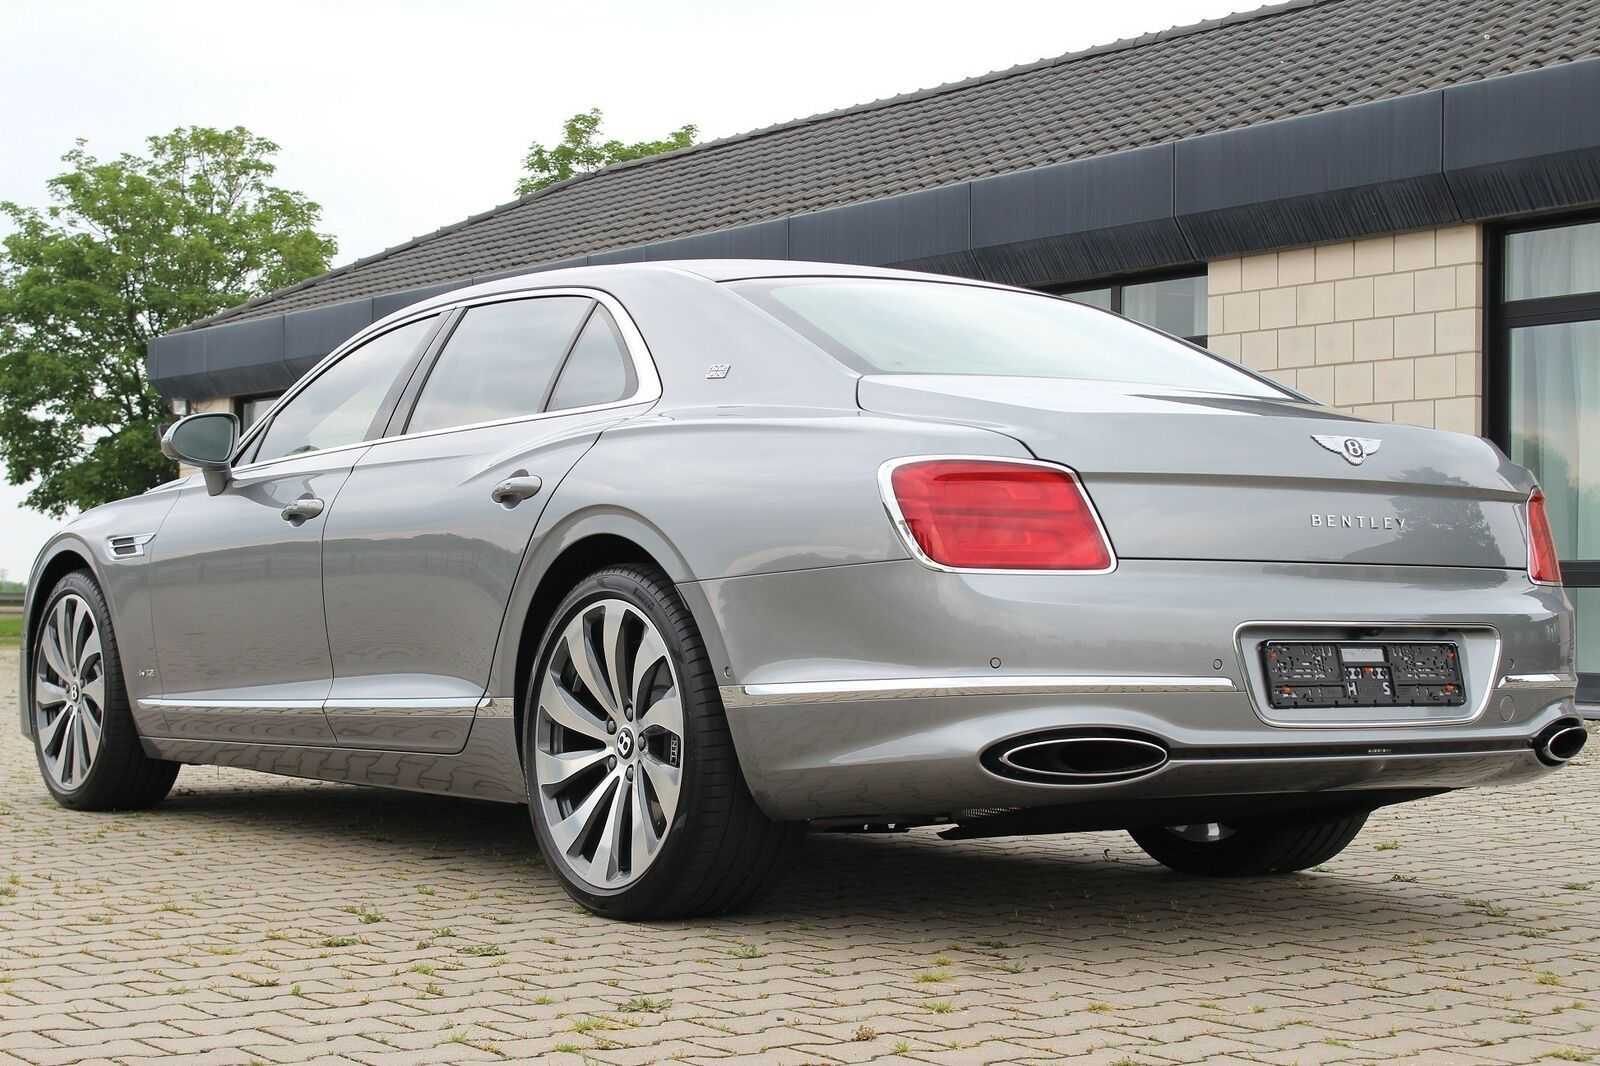 38+ Bentley flying spur w12 price 4k UHD